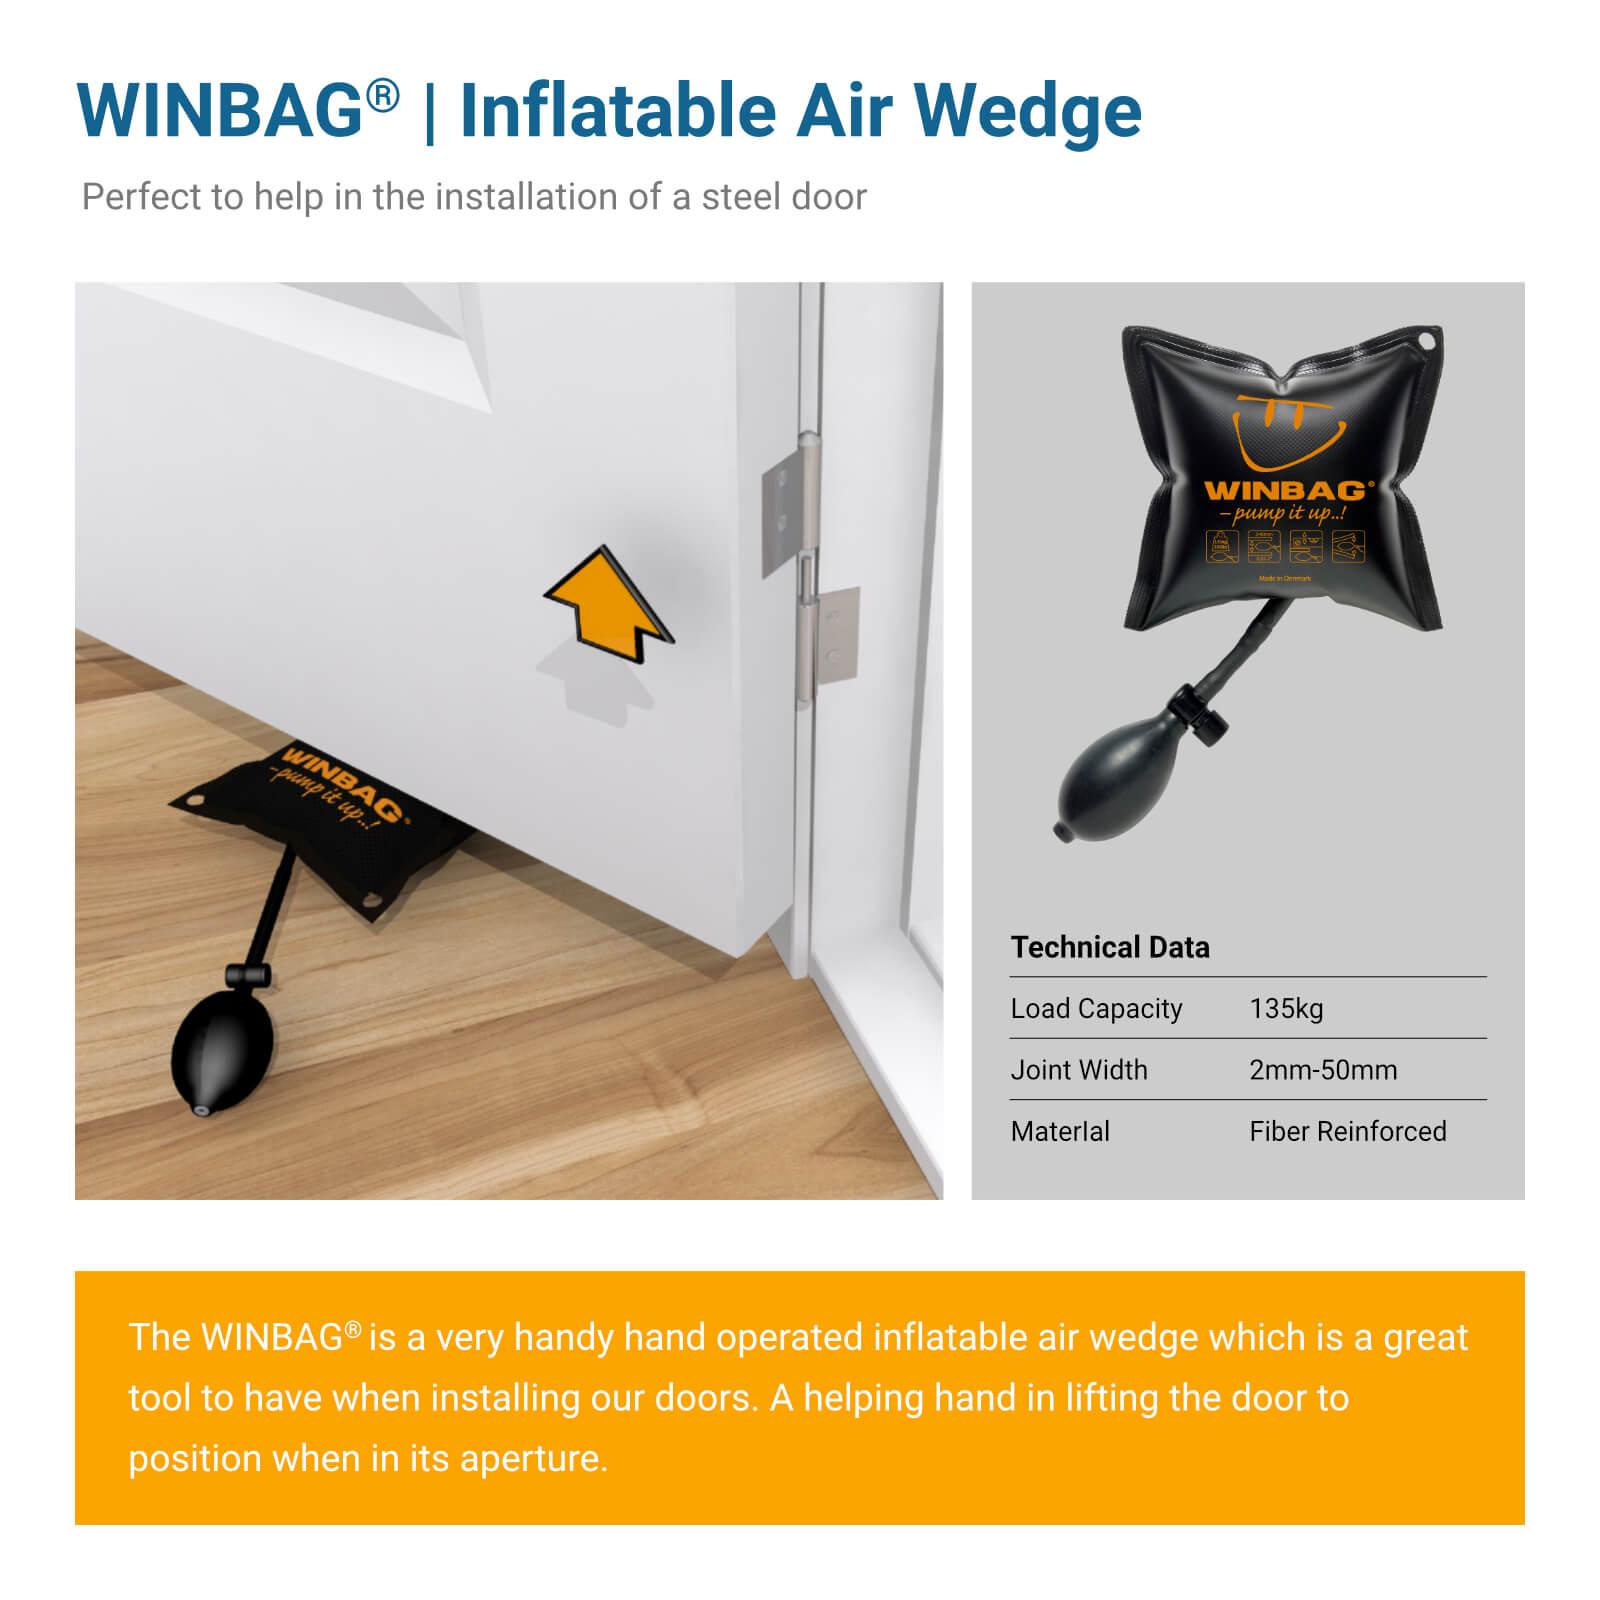 WINBAG More Information